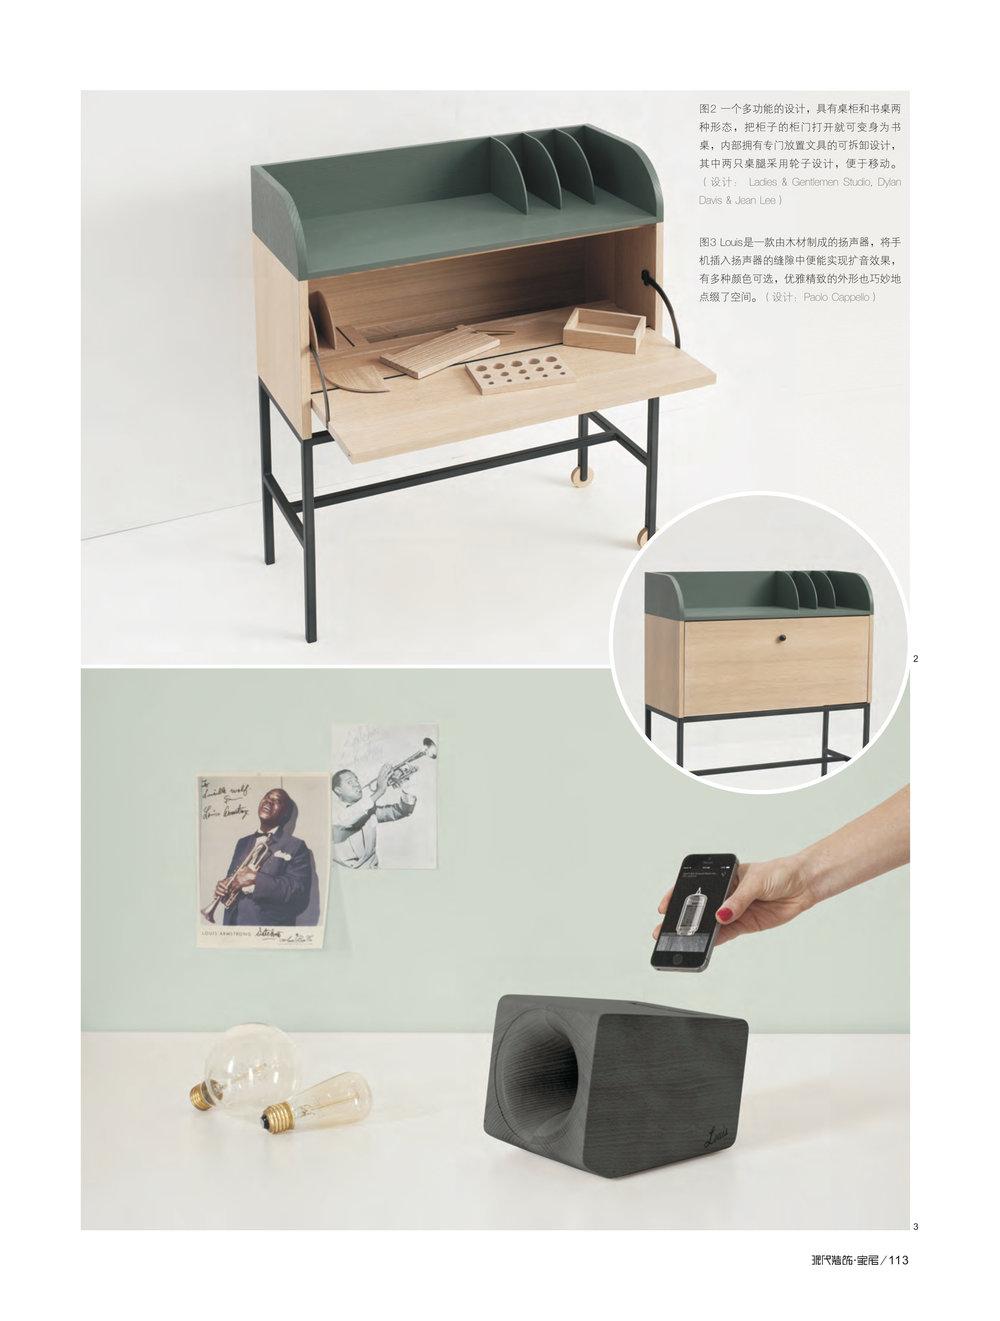 42016_11_modern decor home_家居封面 4.jpg